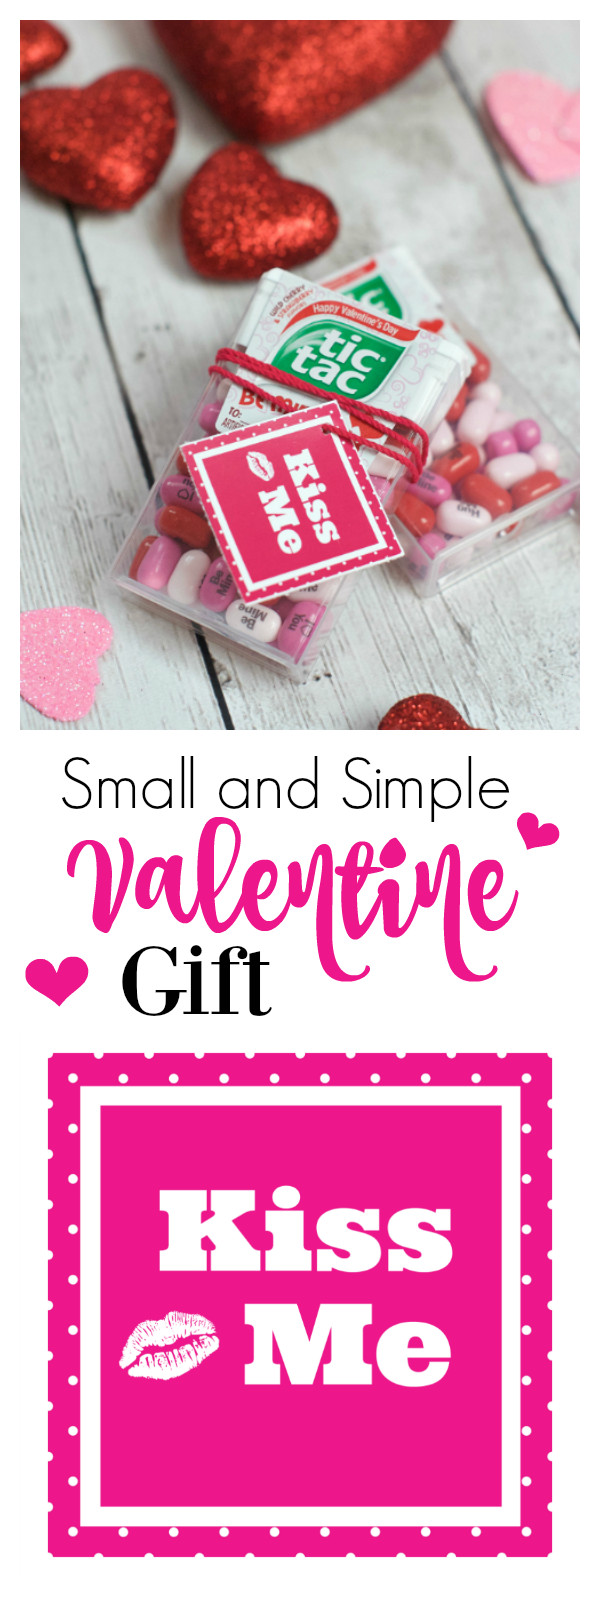 Small Valentines Gift Ideas  Simple & Small Valentine Gift Kiss Me Valentine – Fun Squared